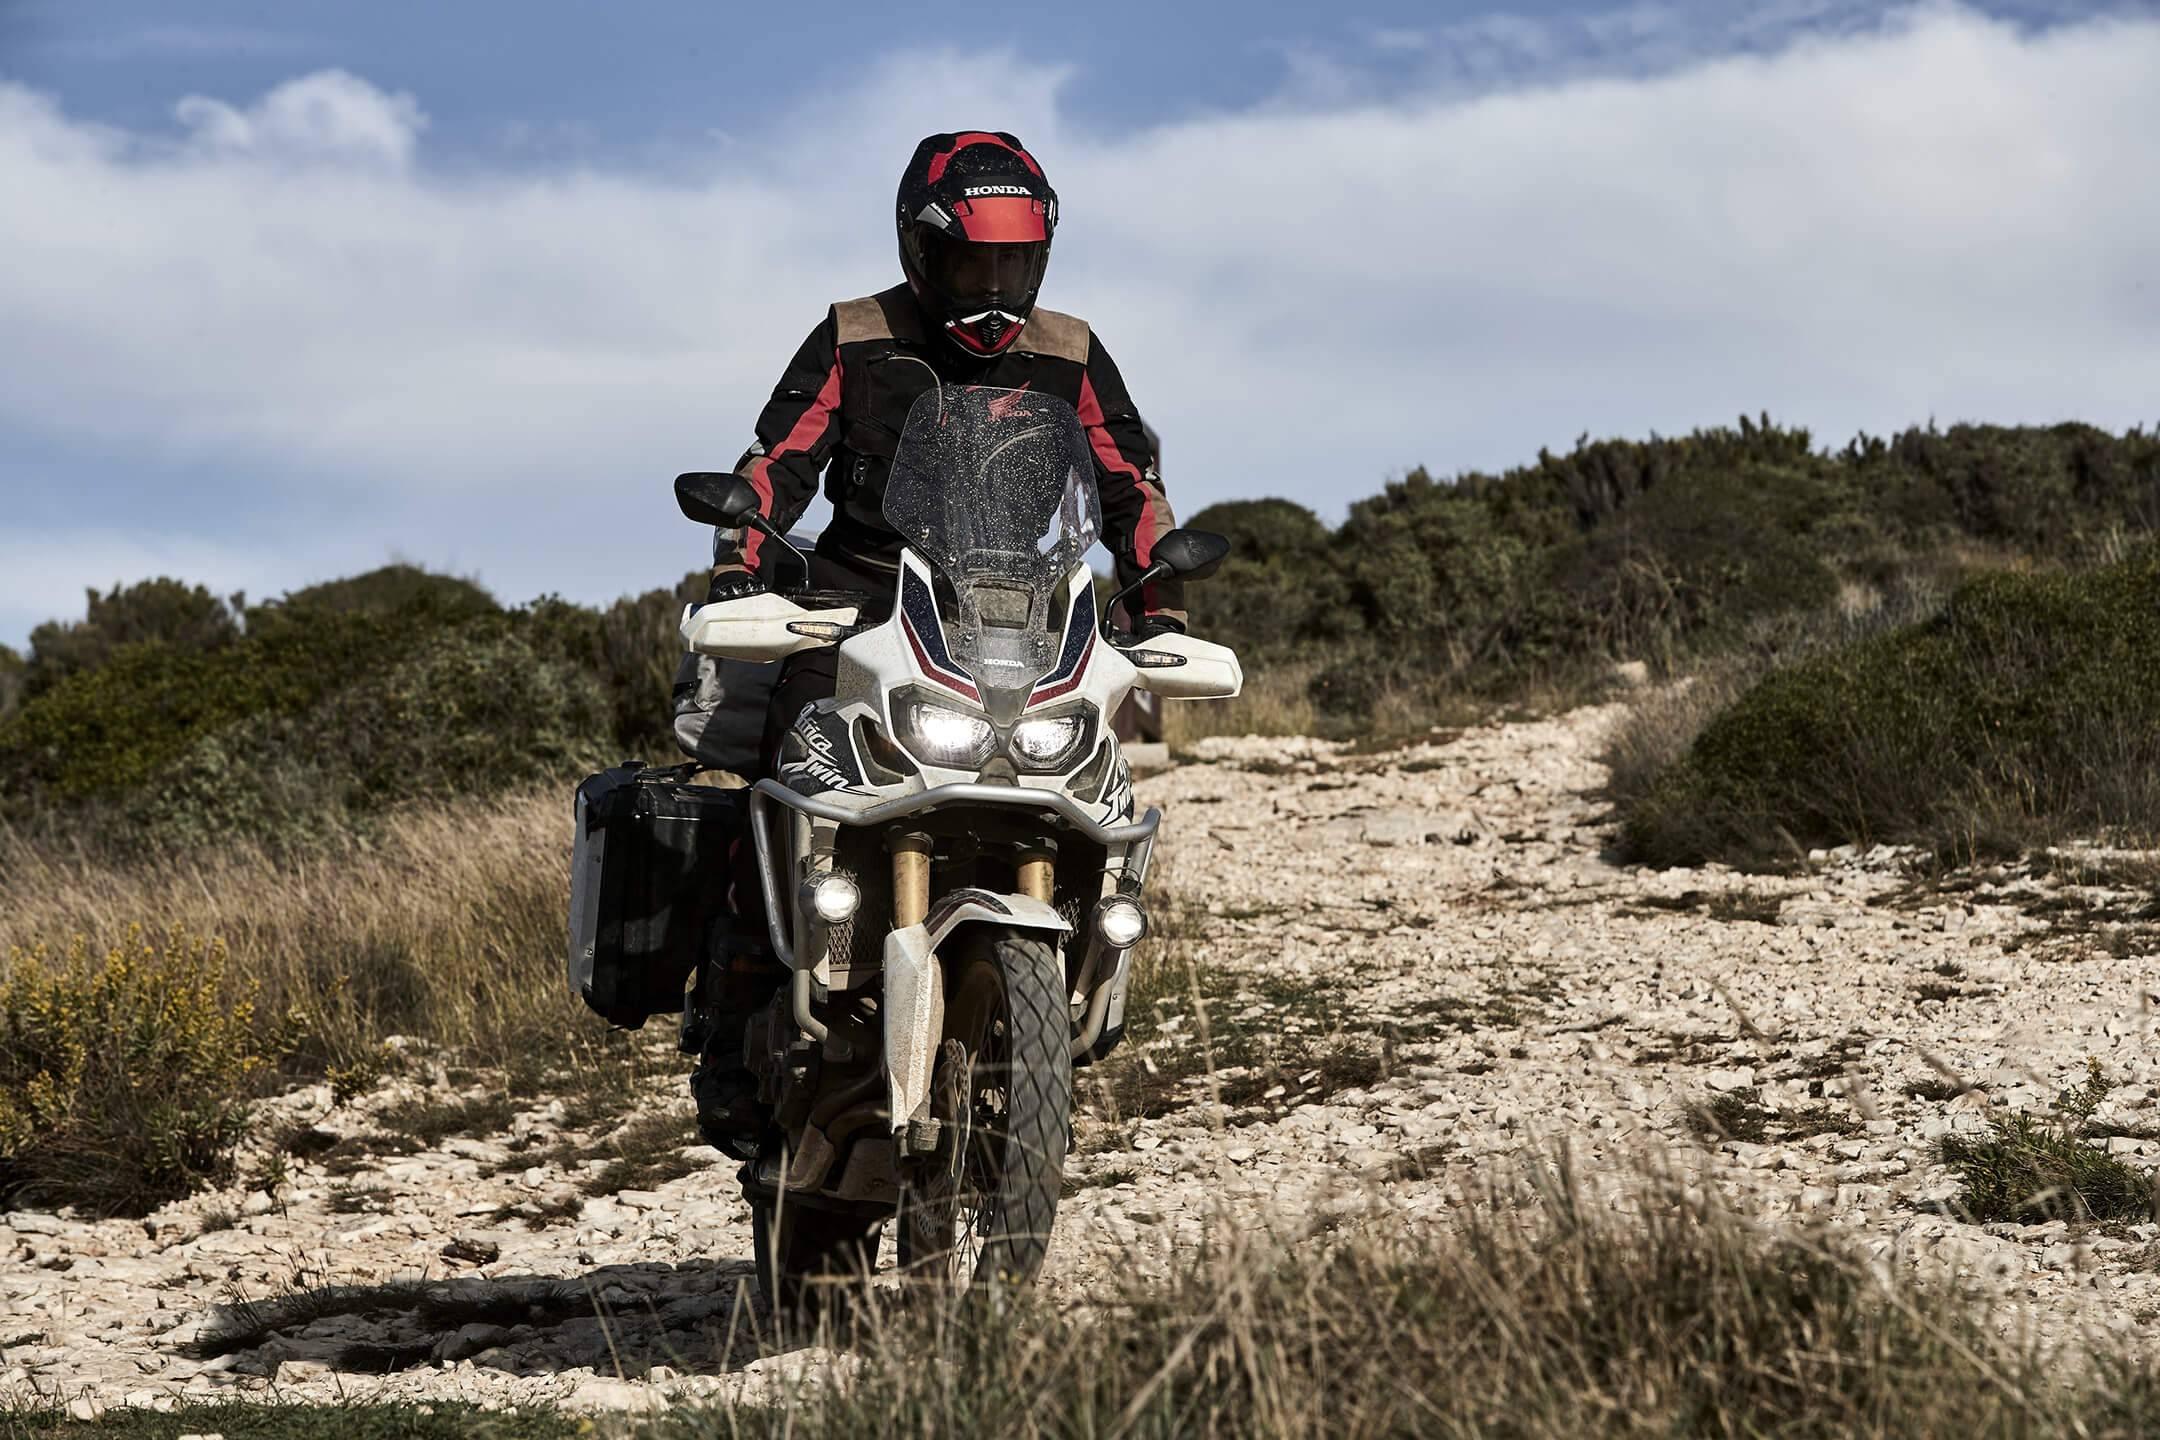 Honda-Motorcycle-BigBike-มอเตอร์ไซค์-ฮอนด้า-บิ๊กไบค์-ข่าวผลิตภัณฑ์-5-skills-for-crf1000l-africa-twin